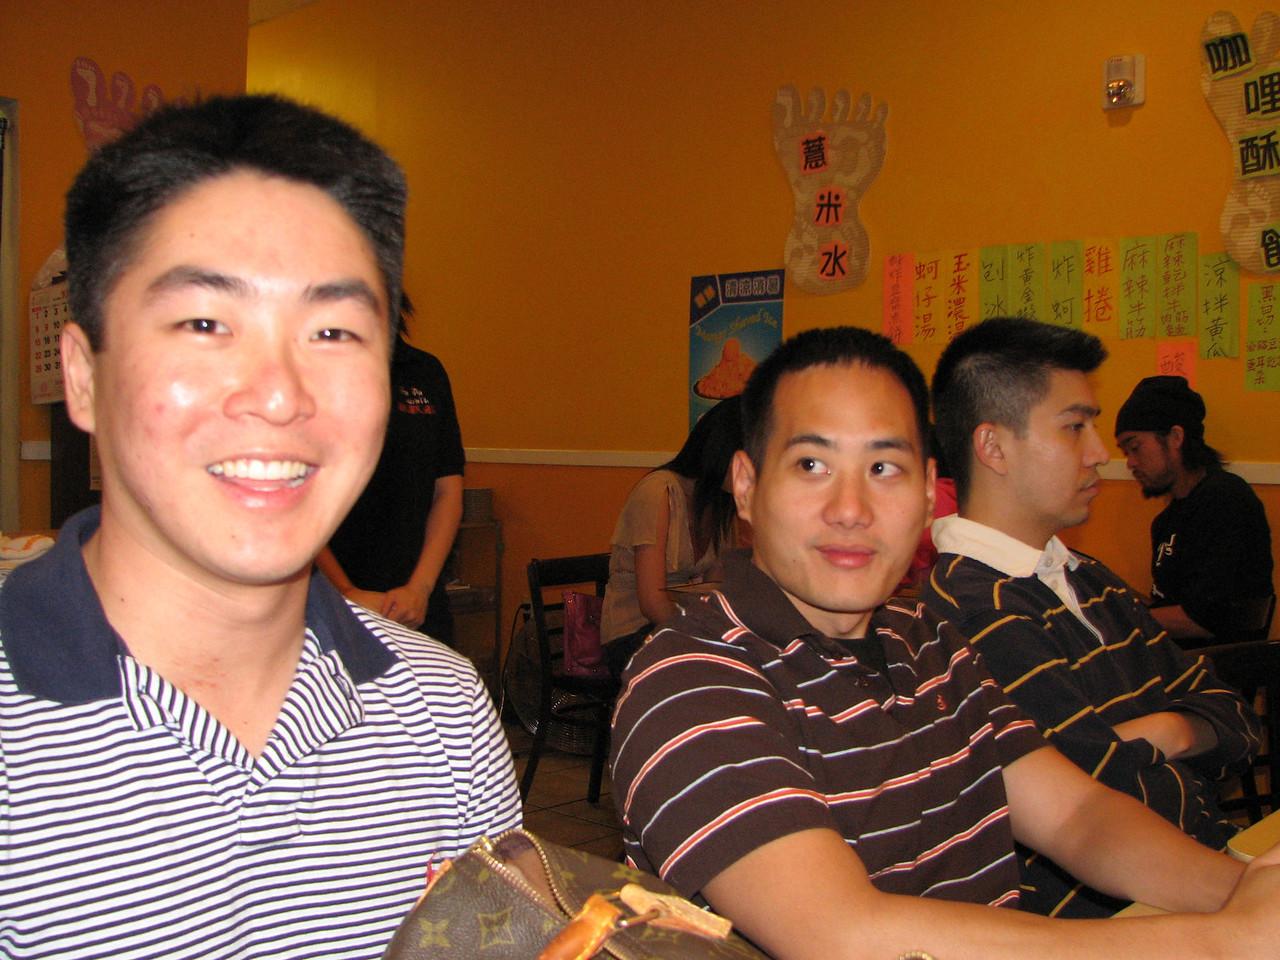 2006 10 29 Sun - Dean Chang & his LV purse, Jimmy Chen & his live in partner Yu-Tsun Cheng 2